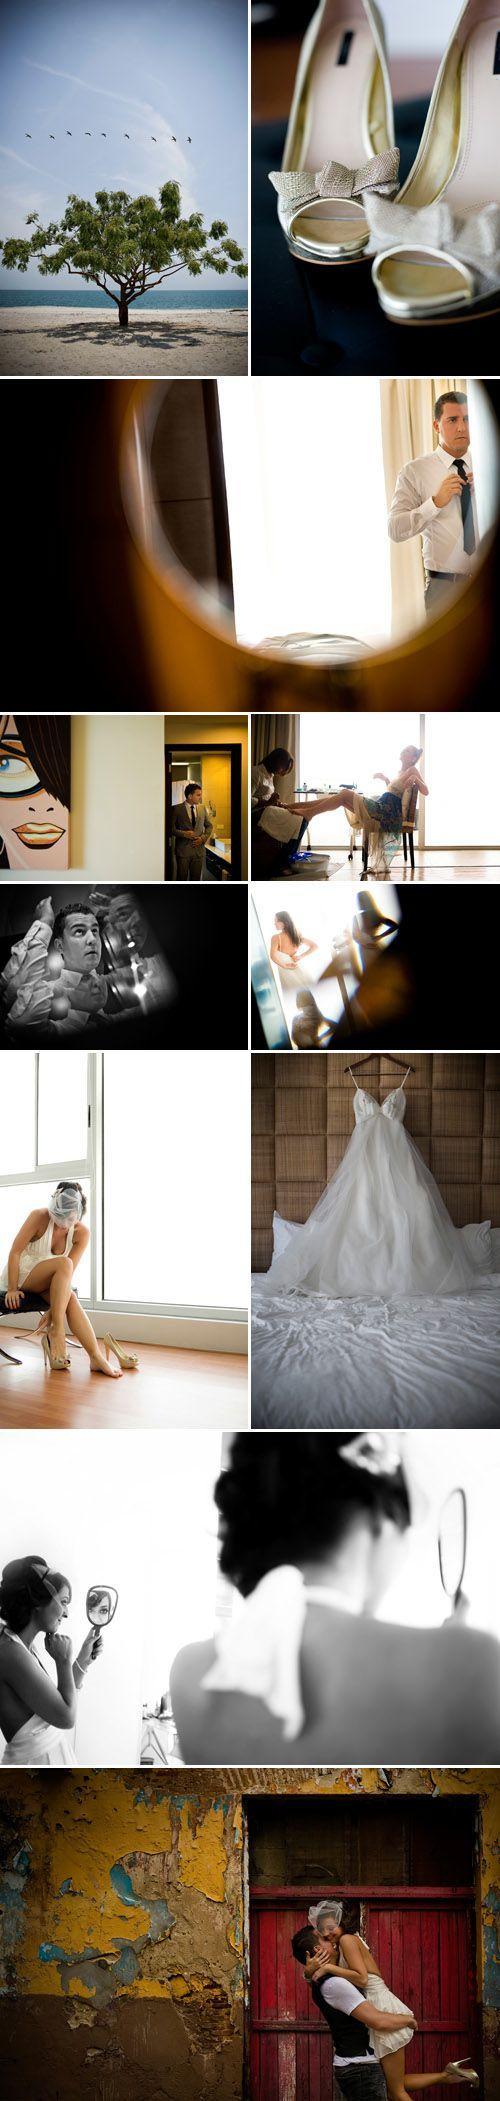 Wedding - Intimate Panama Destination Elopement